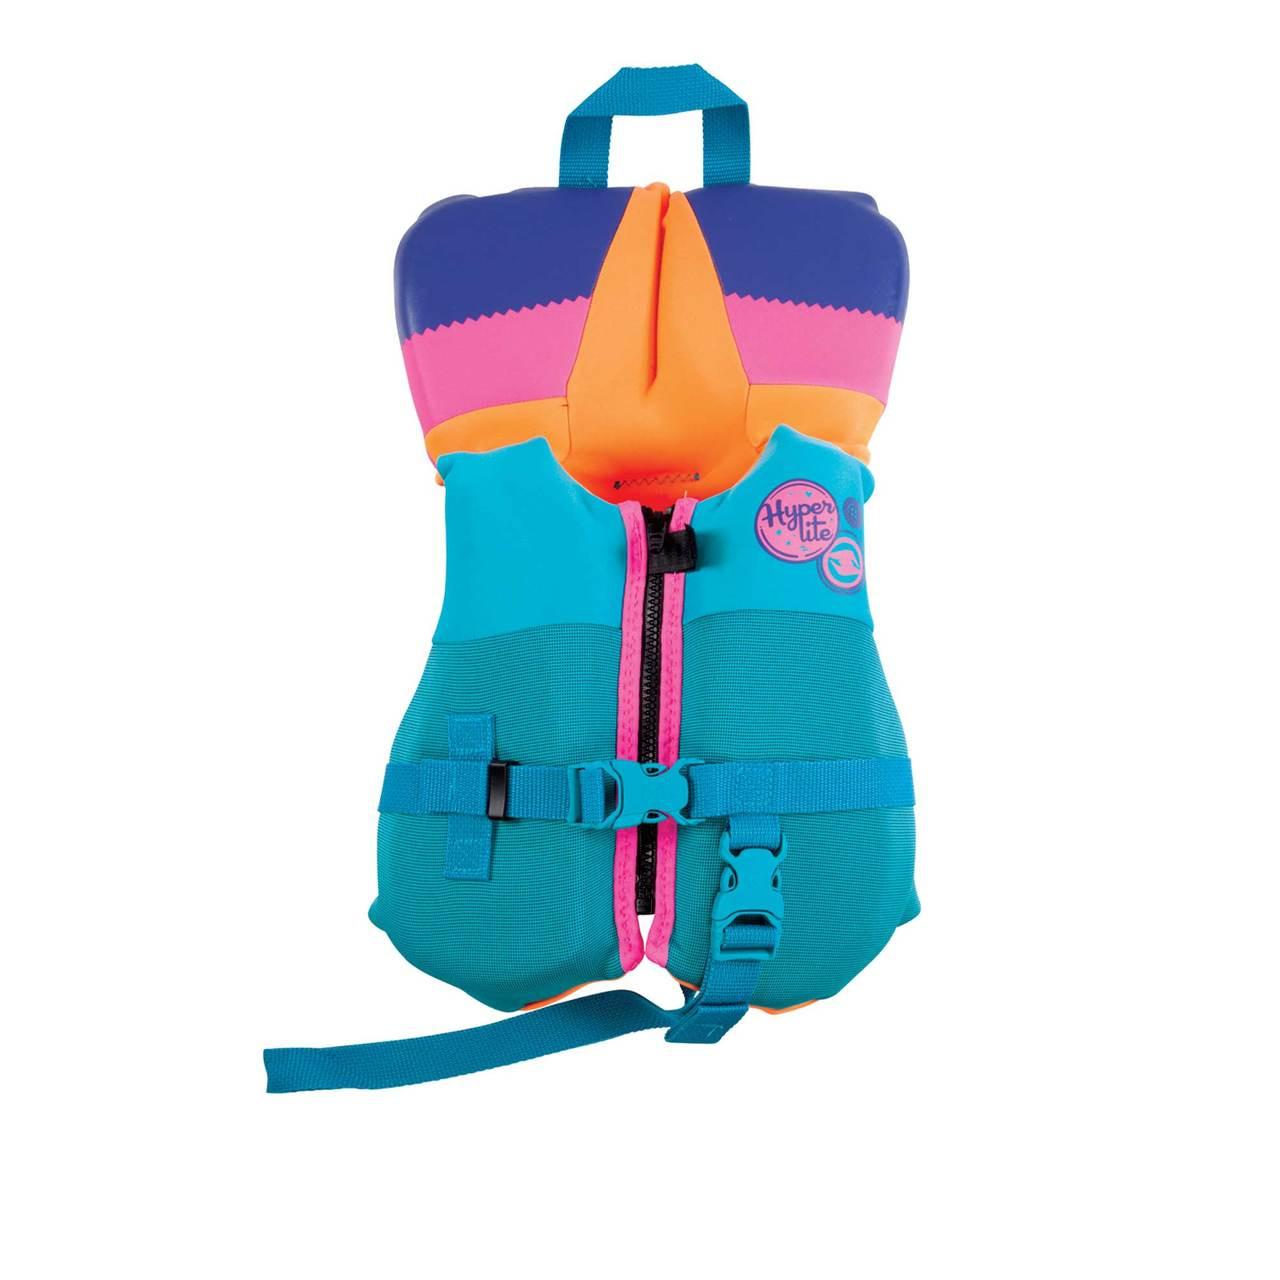 c3ea42376dc 2019 Hyperlite Girls Toddler 0-30lb Life Vest